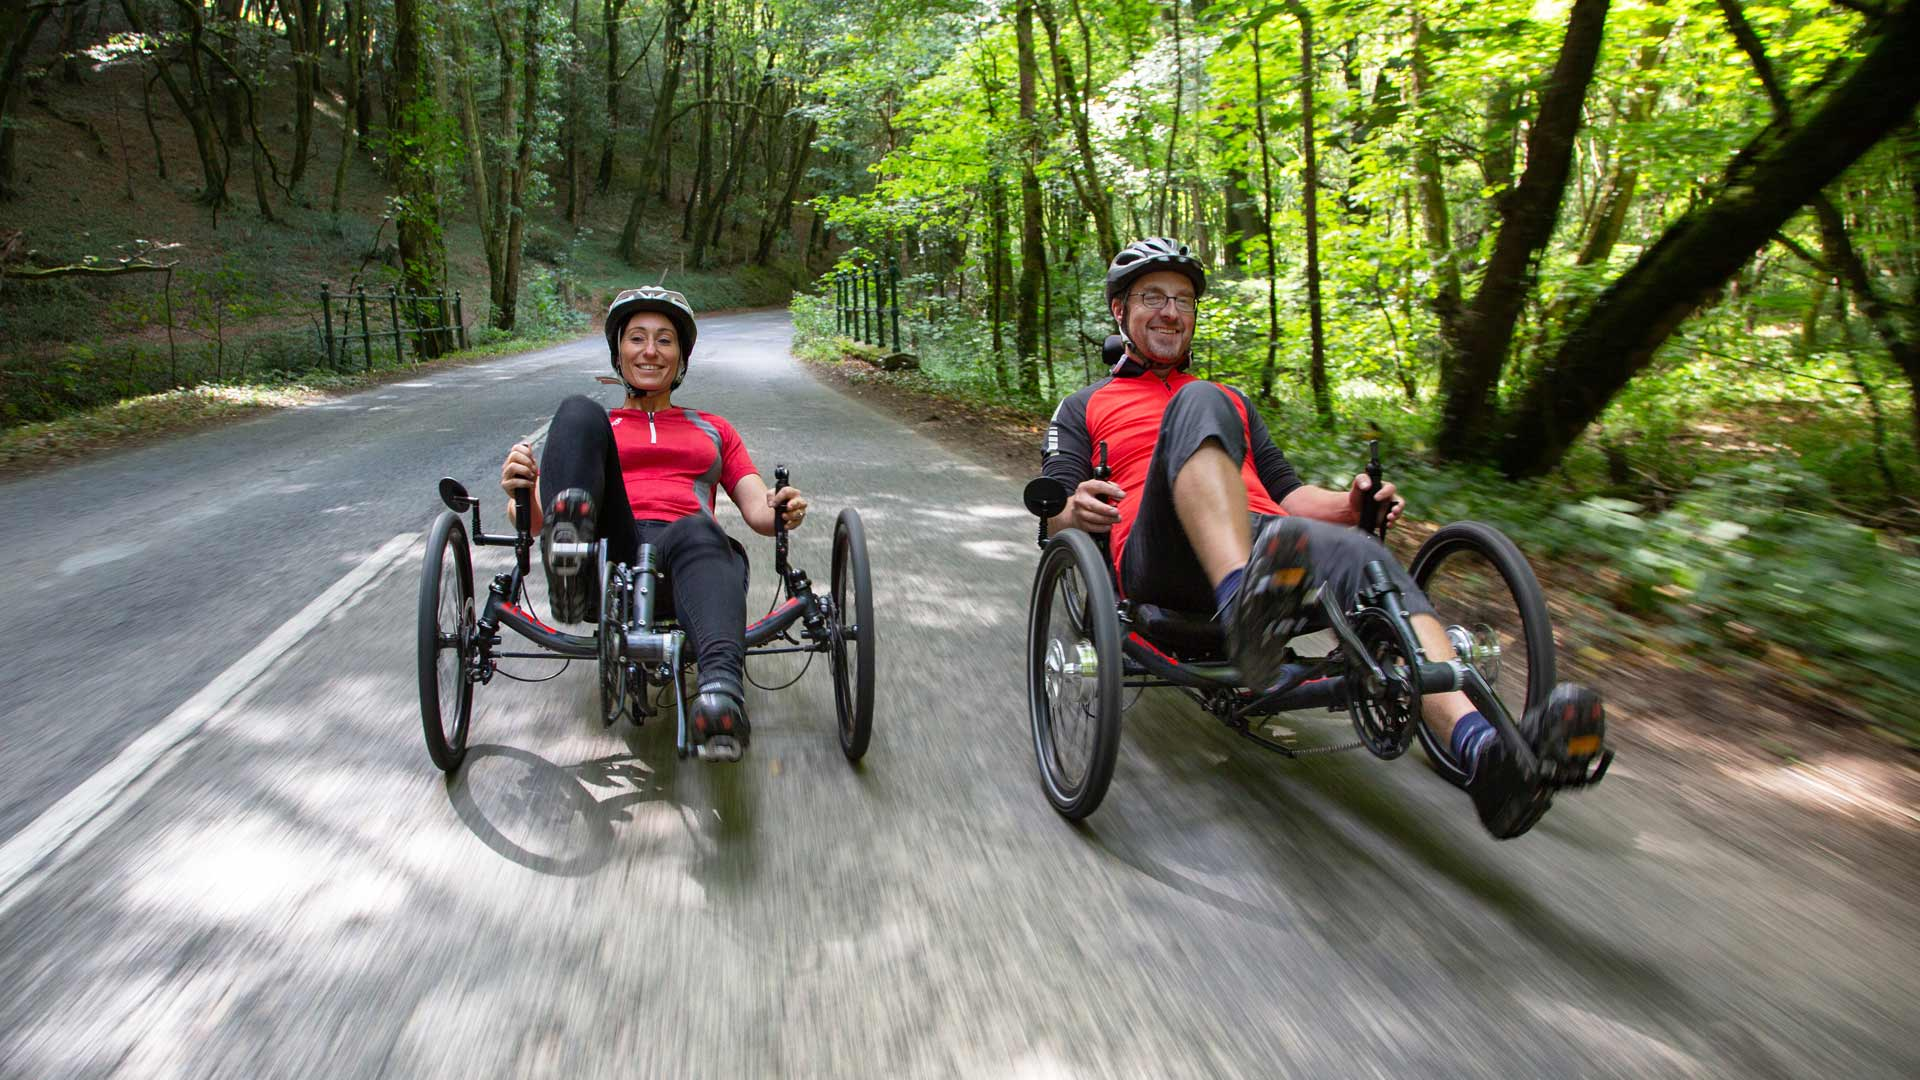 ICE Recumbent Trikes, Bikes - Electric Assist, Laid Back Folding